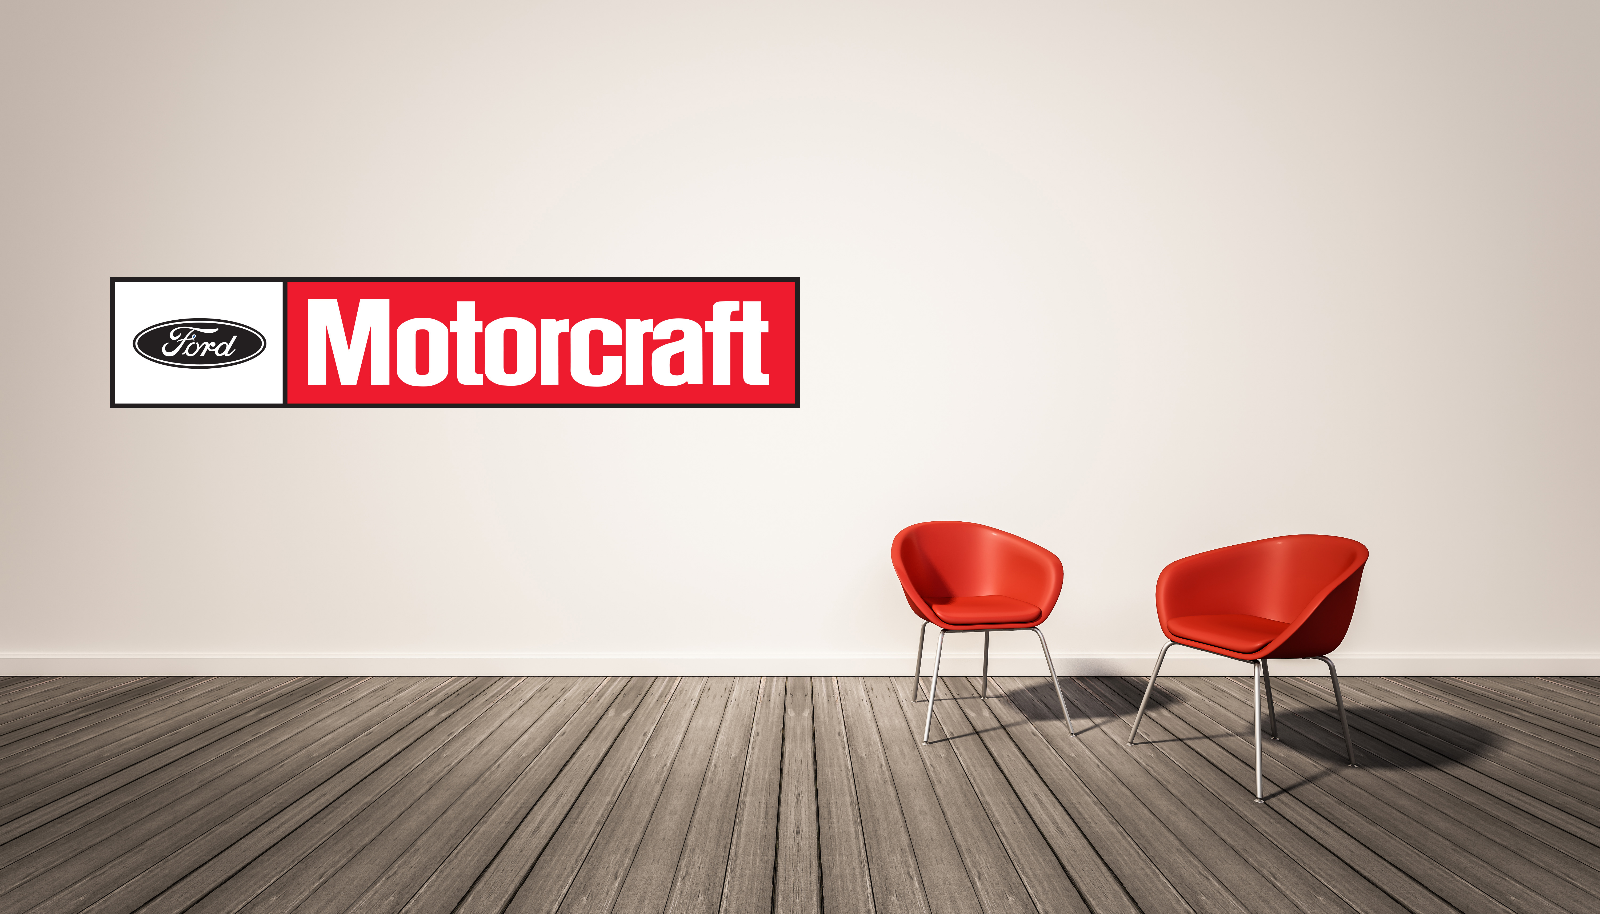 Ford Motorcraft Logo Wall Decal  Vinyl Racing Decor Room